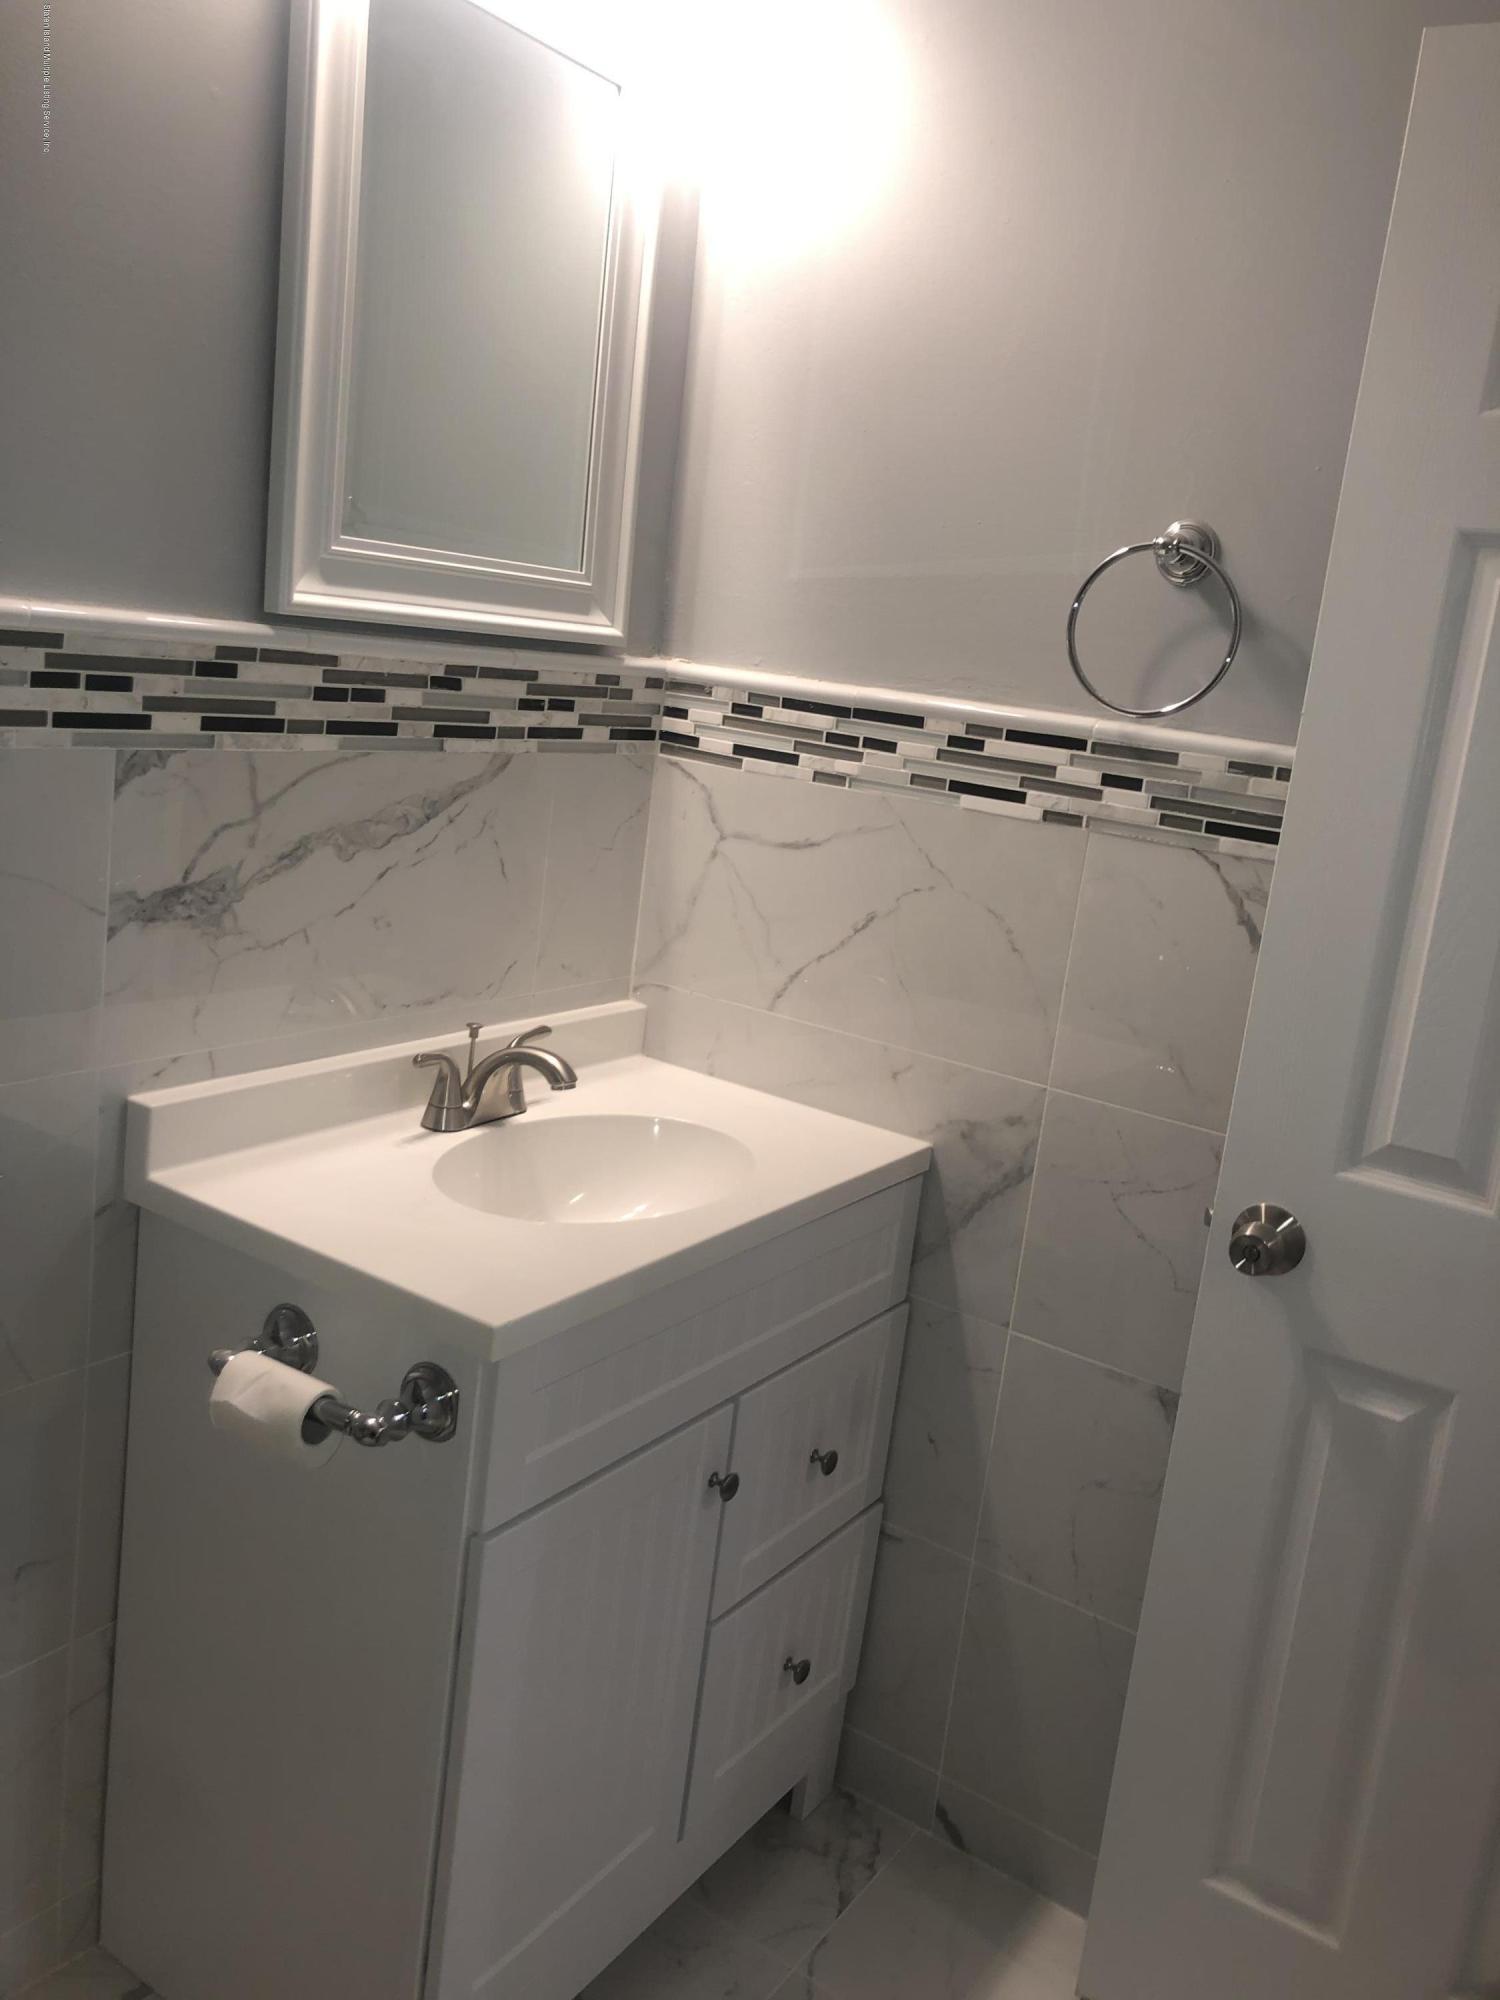 340 Timber Ridge Drive,Staten Island,New York,10306,United States,1 Bedroom Bedrooms,3 Rooms Rooms,1 BathroomBathrooms,Res-Rental,Timber Ridge,1136554